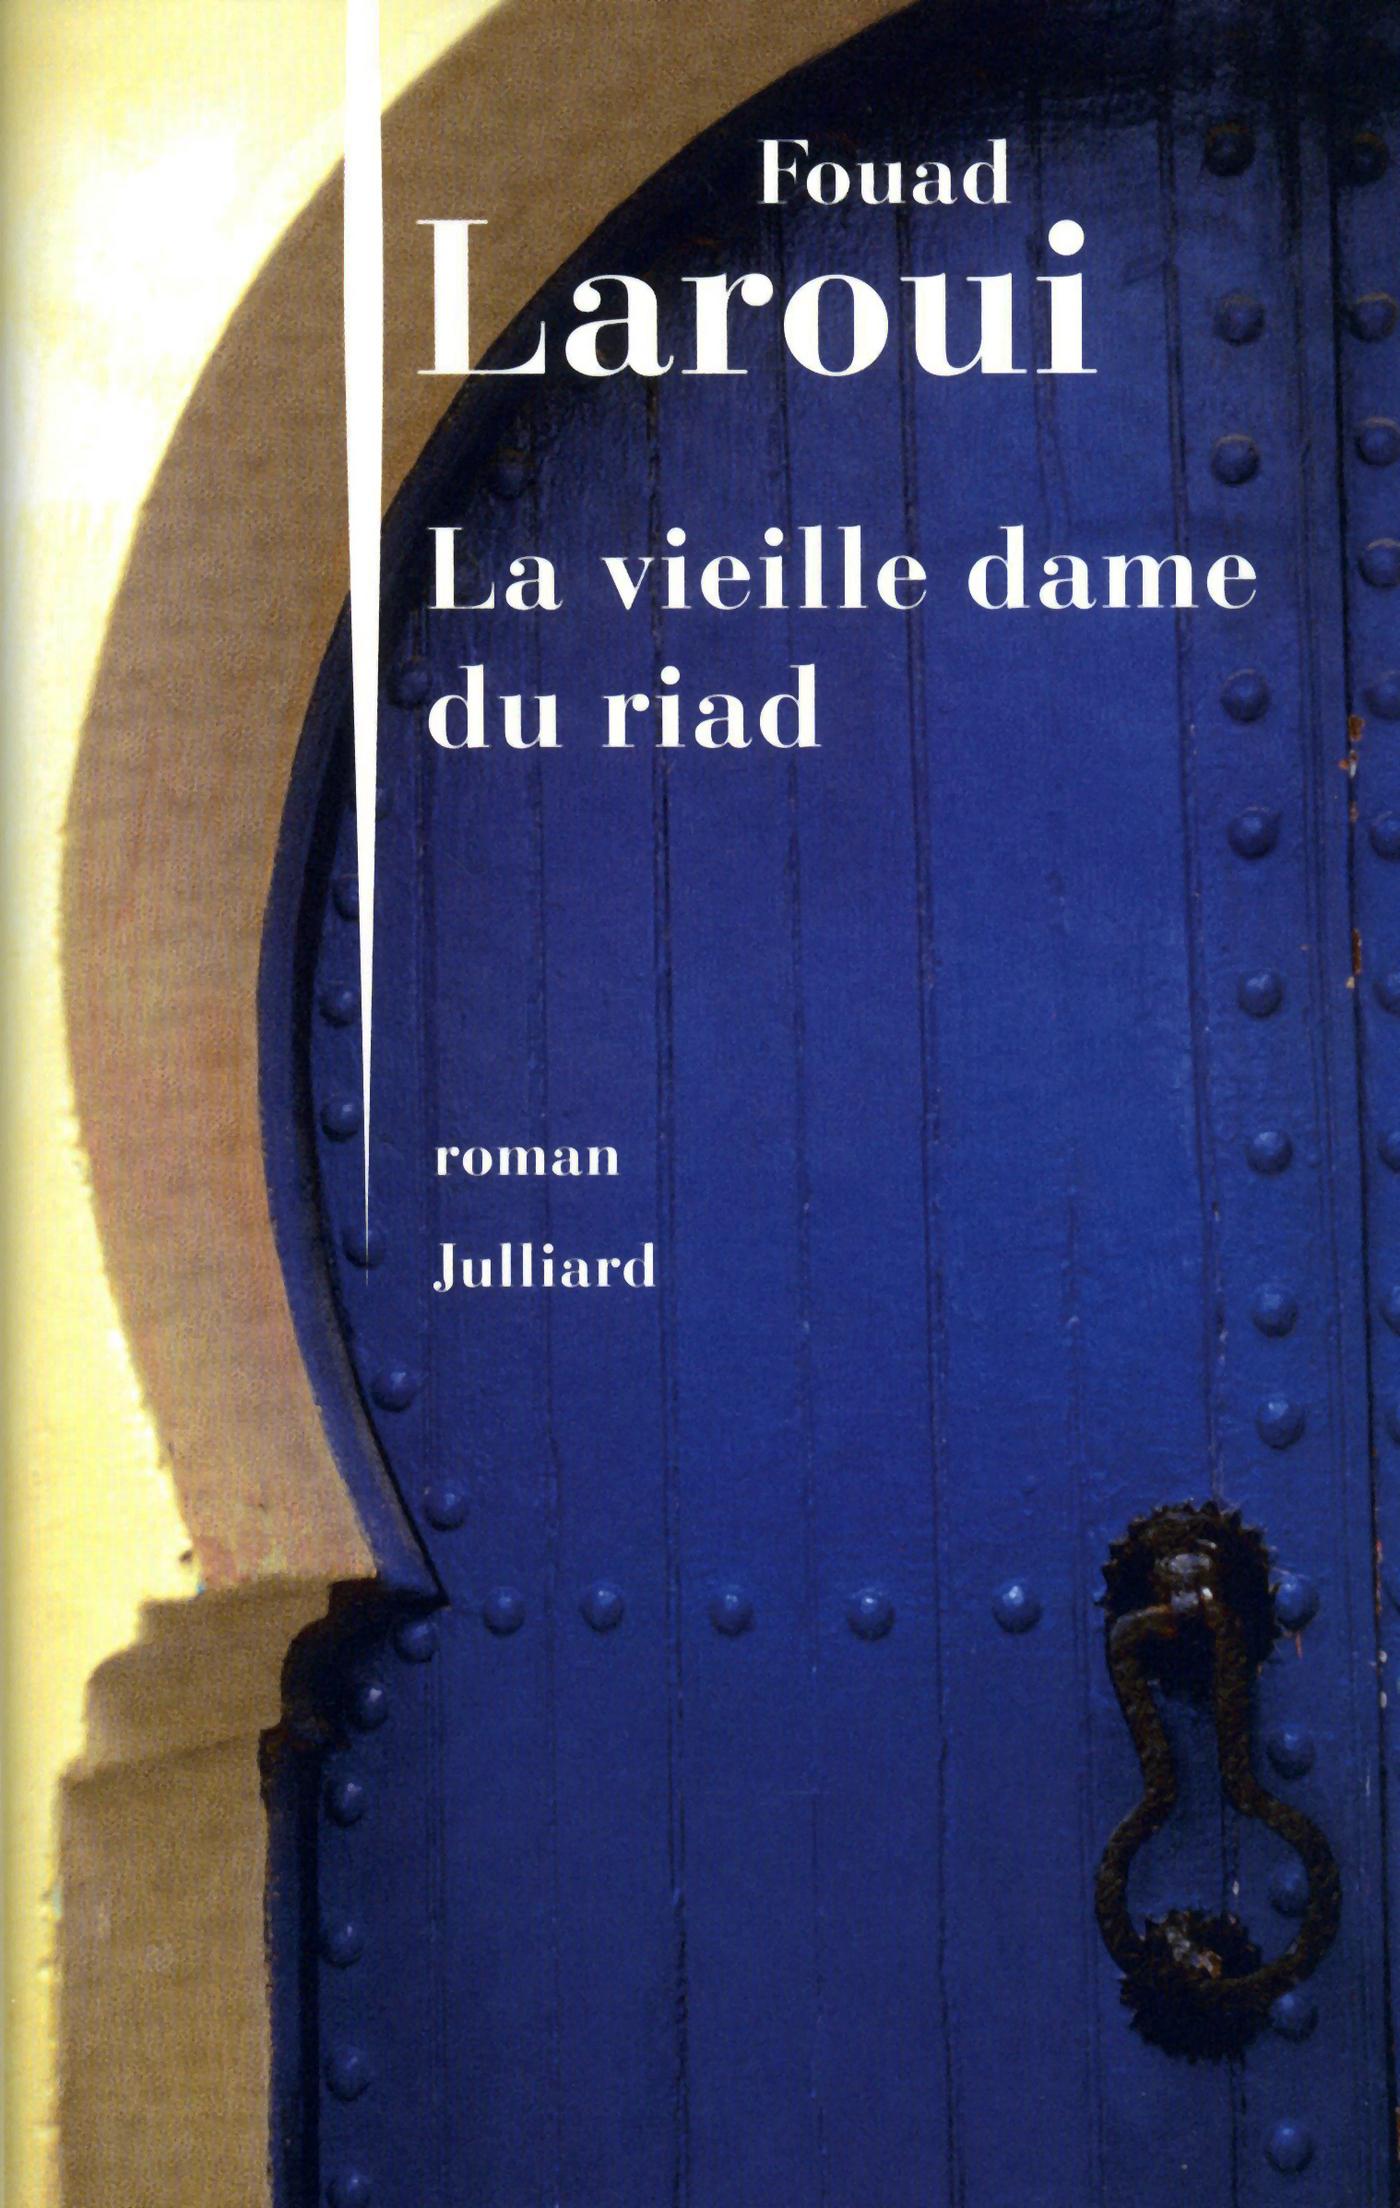 La Vieille Dame du riad   LAROUI, Fouad